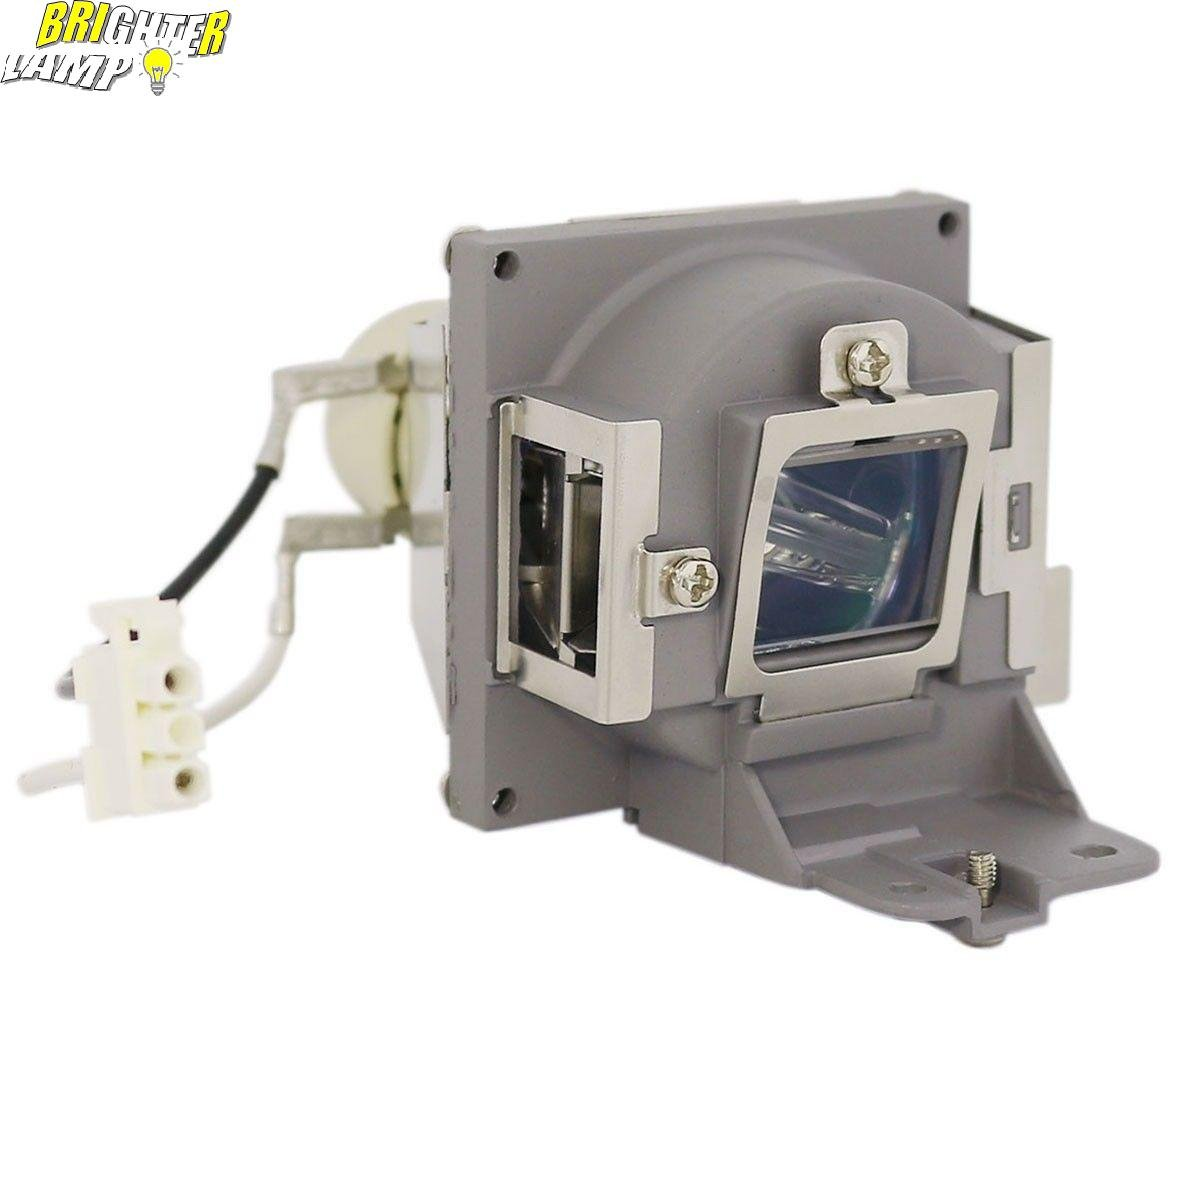 Brighter Lamp LMS-521P / 522P プロジェクターランプ 対応 BENQ DLP プロジェクター MS521P / MX522P 交換用   B074V6JS82